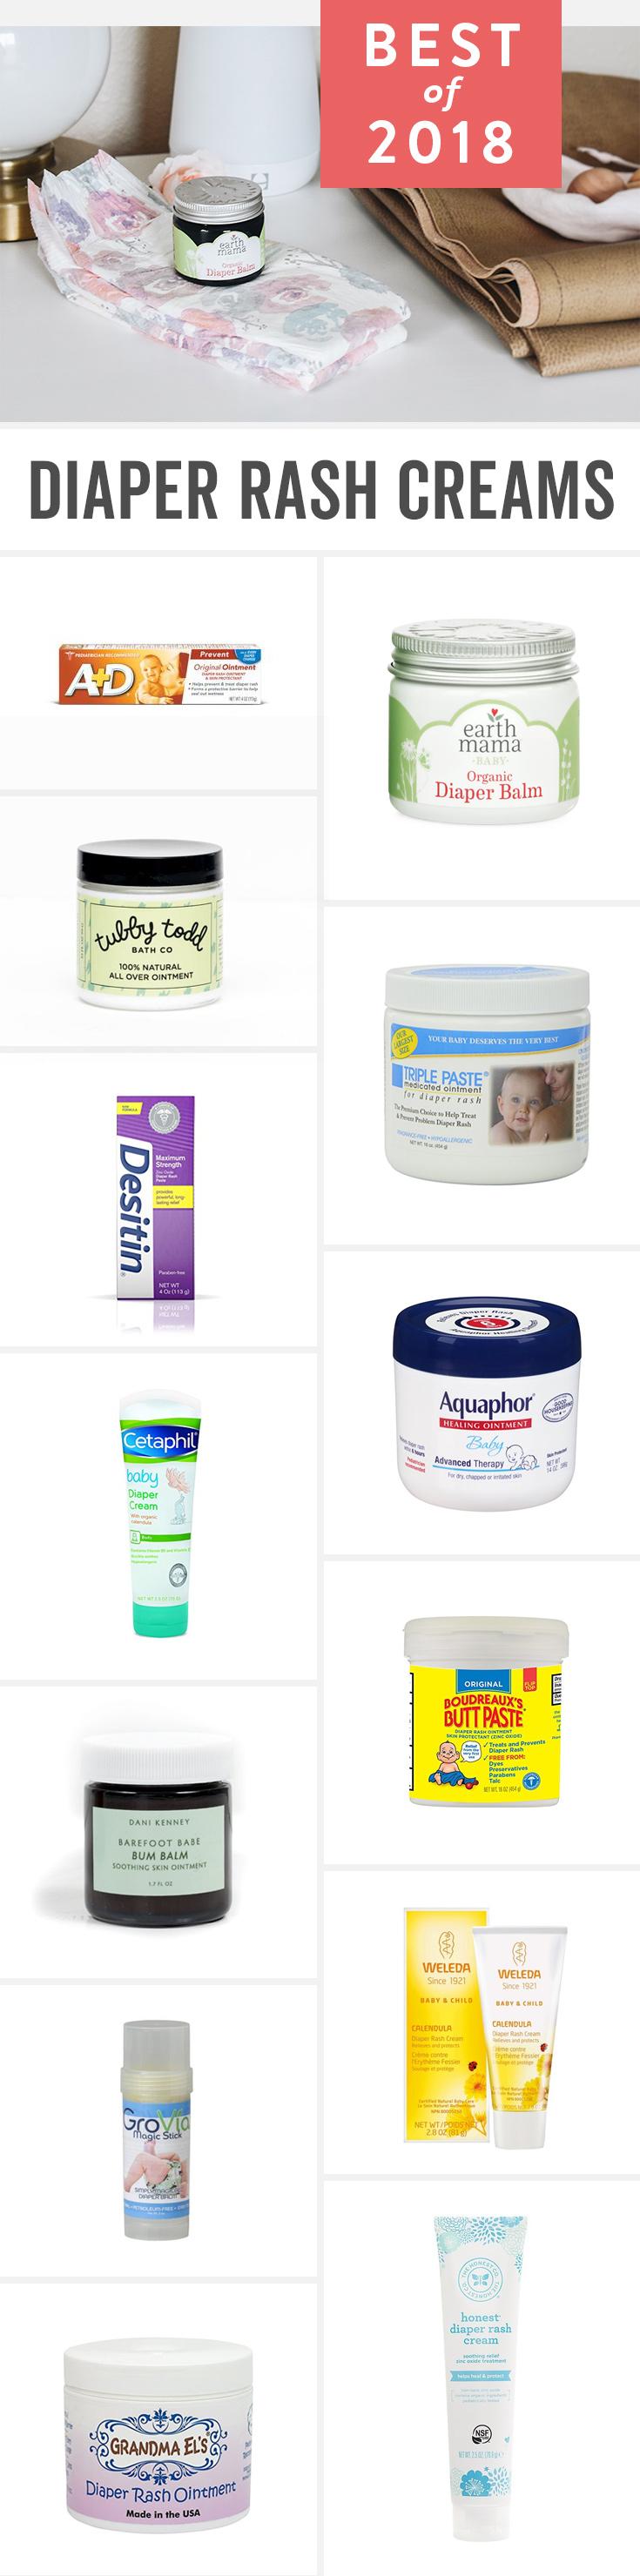 Aweinspiring 2018 Diaper Rash Cream Cats Diaper Rash Se Diaper Rash Remedies Diaper Rash Creams Diaper Rash Creams Jock Itch Diaper Rash Cream Need To Know How To Get Rid baby Diaper Rash Cream